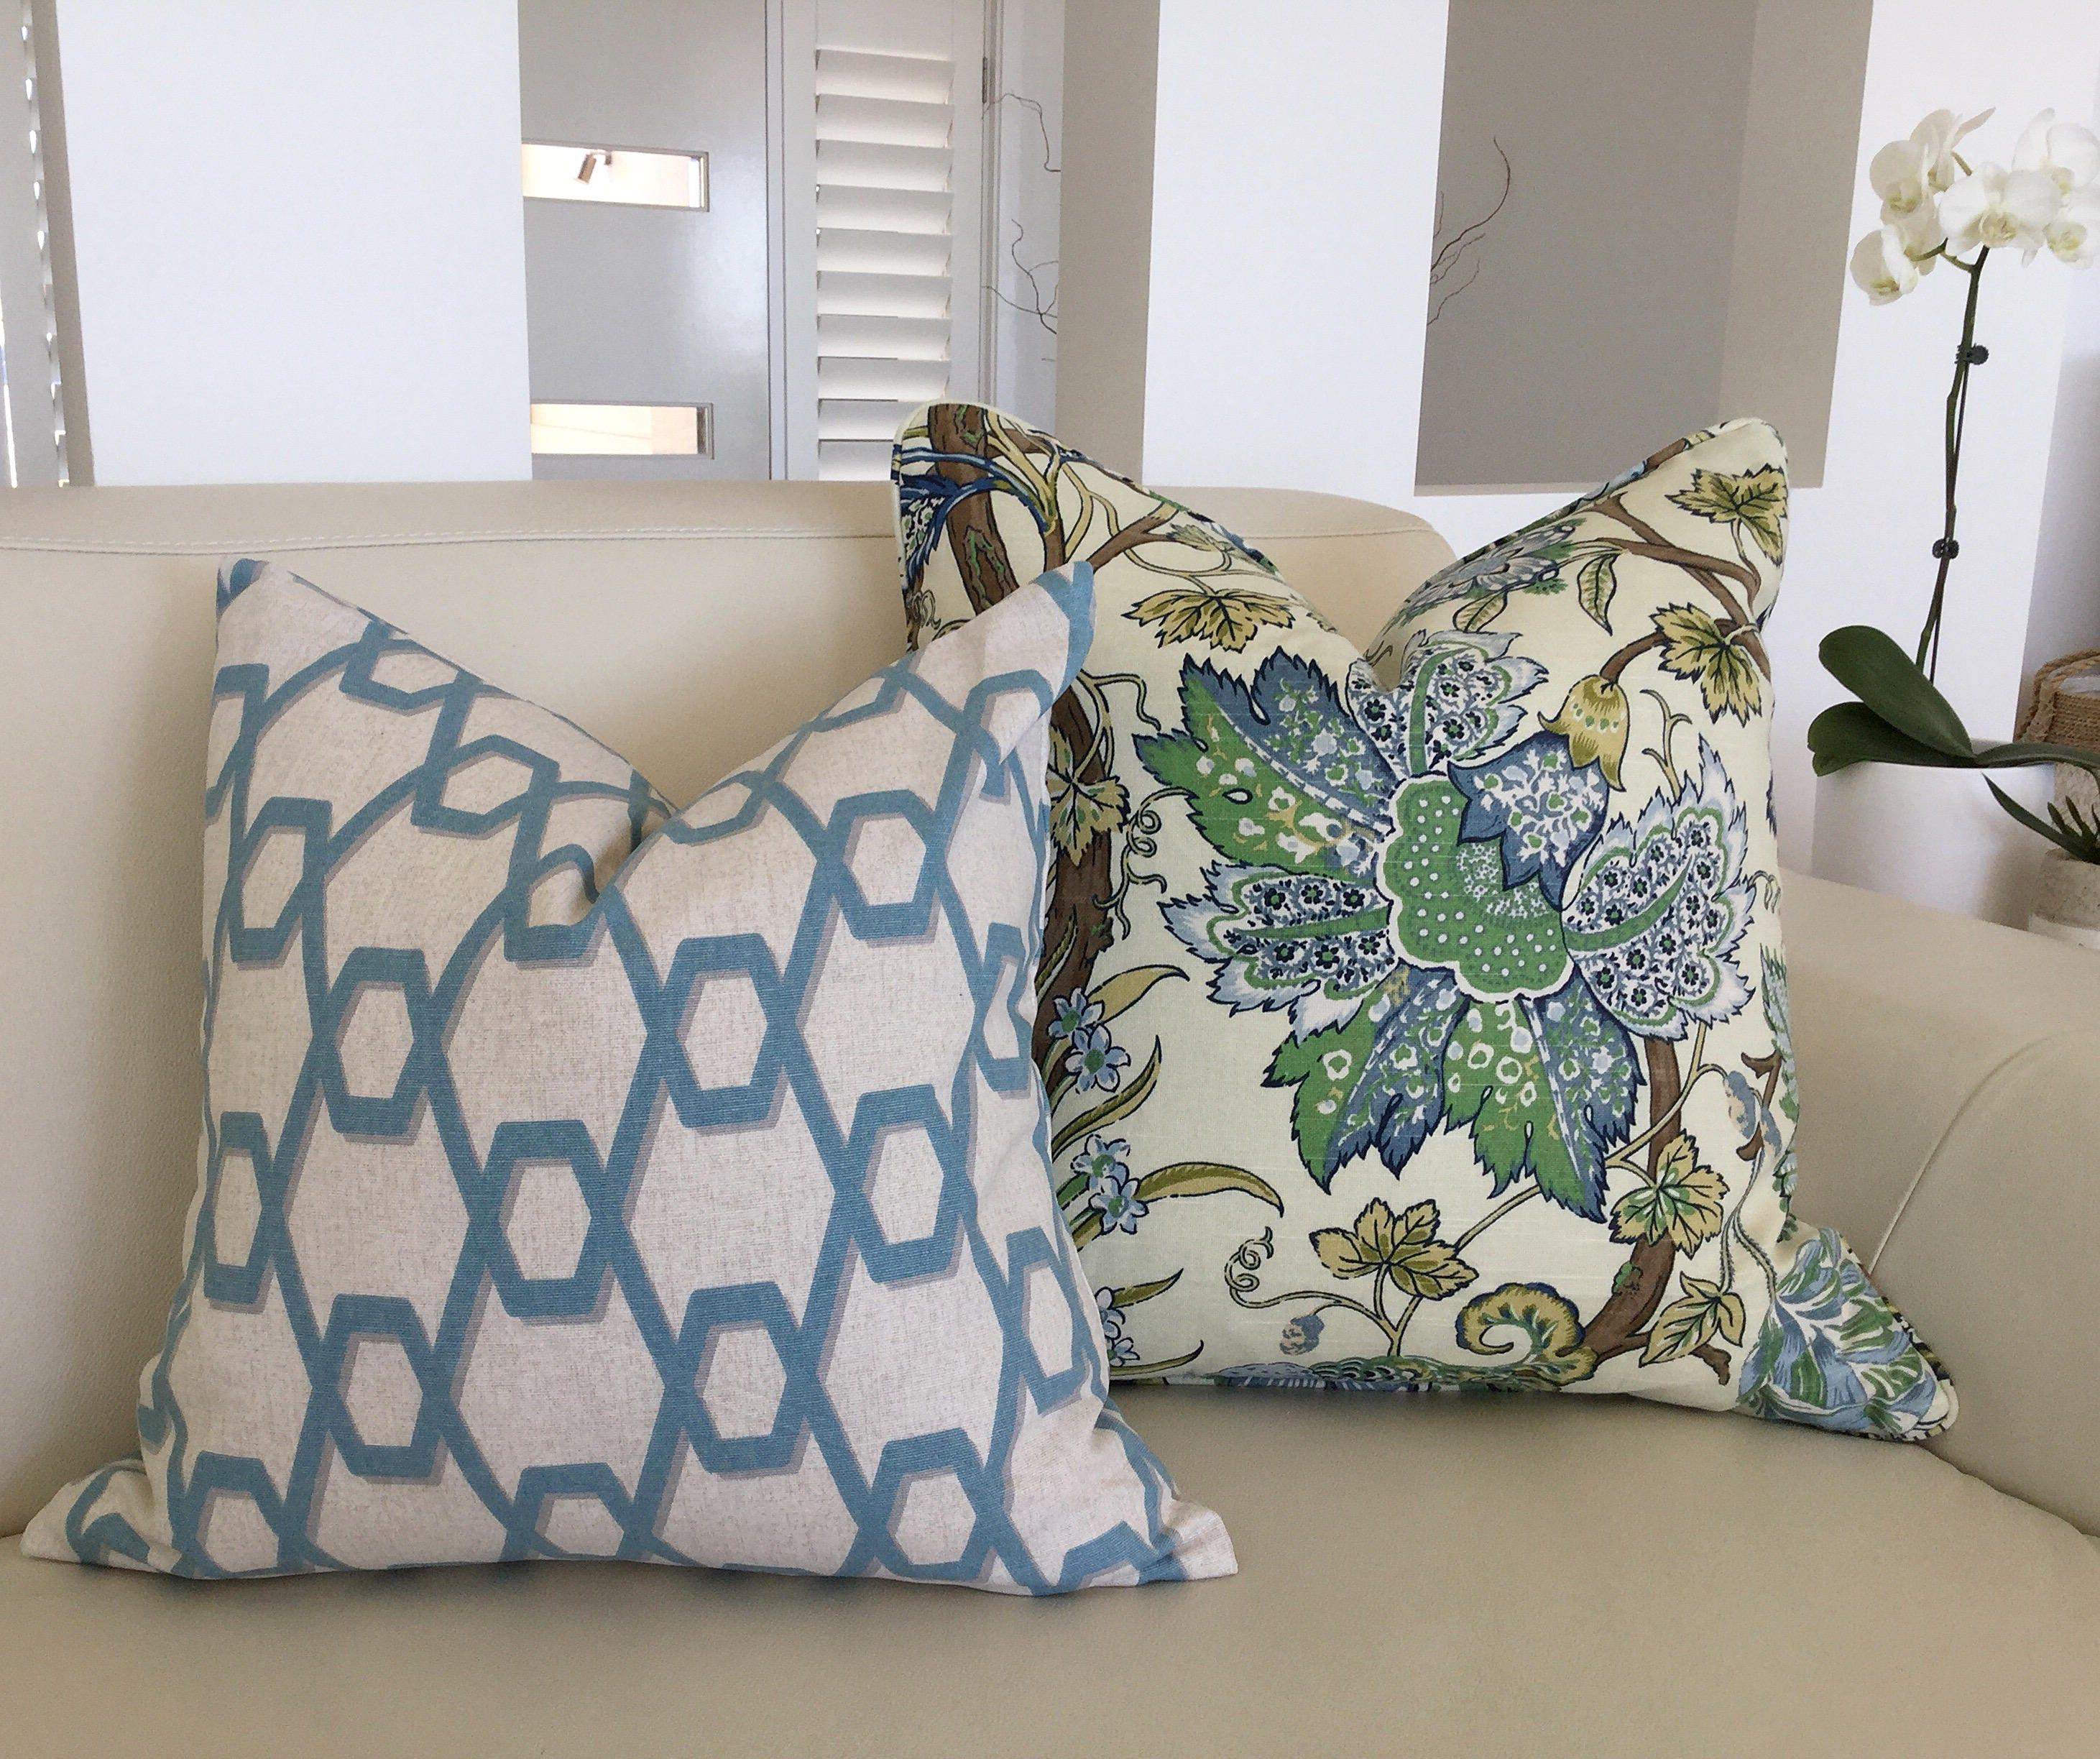 Hampton Style Airy Linens Fresh Blues: Hamptons Style Cushions Hampton's Pillows. Cushion Cover